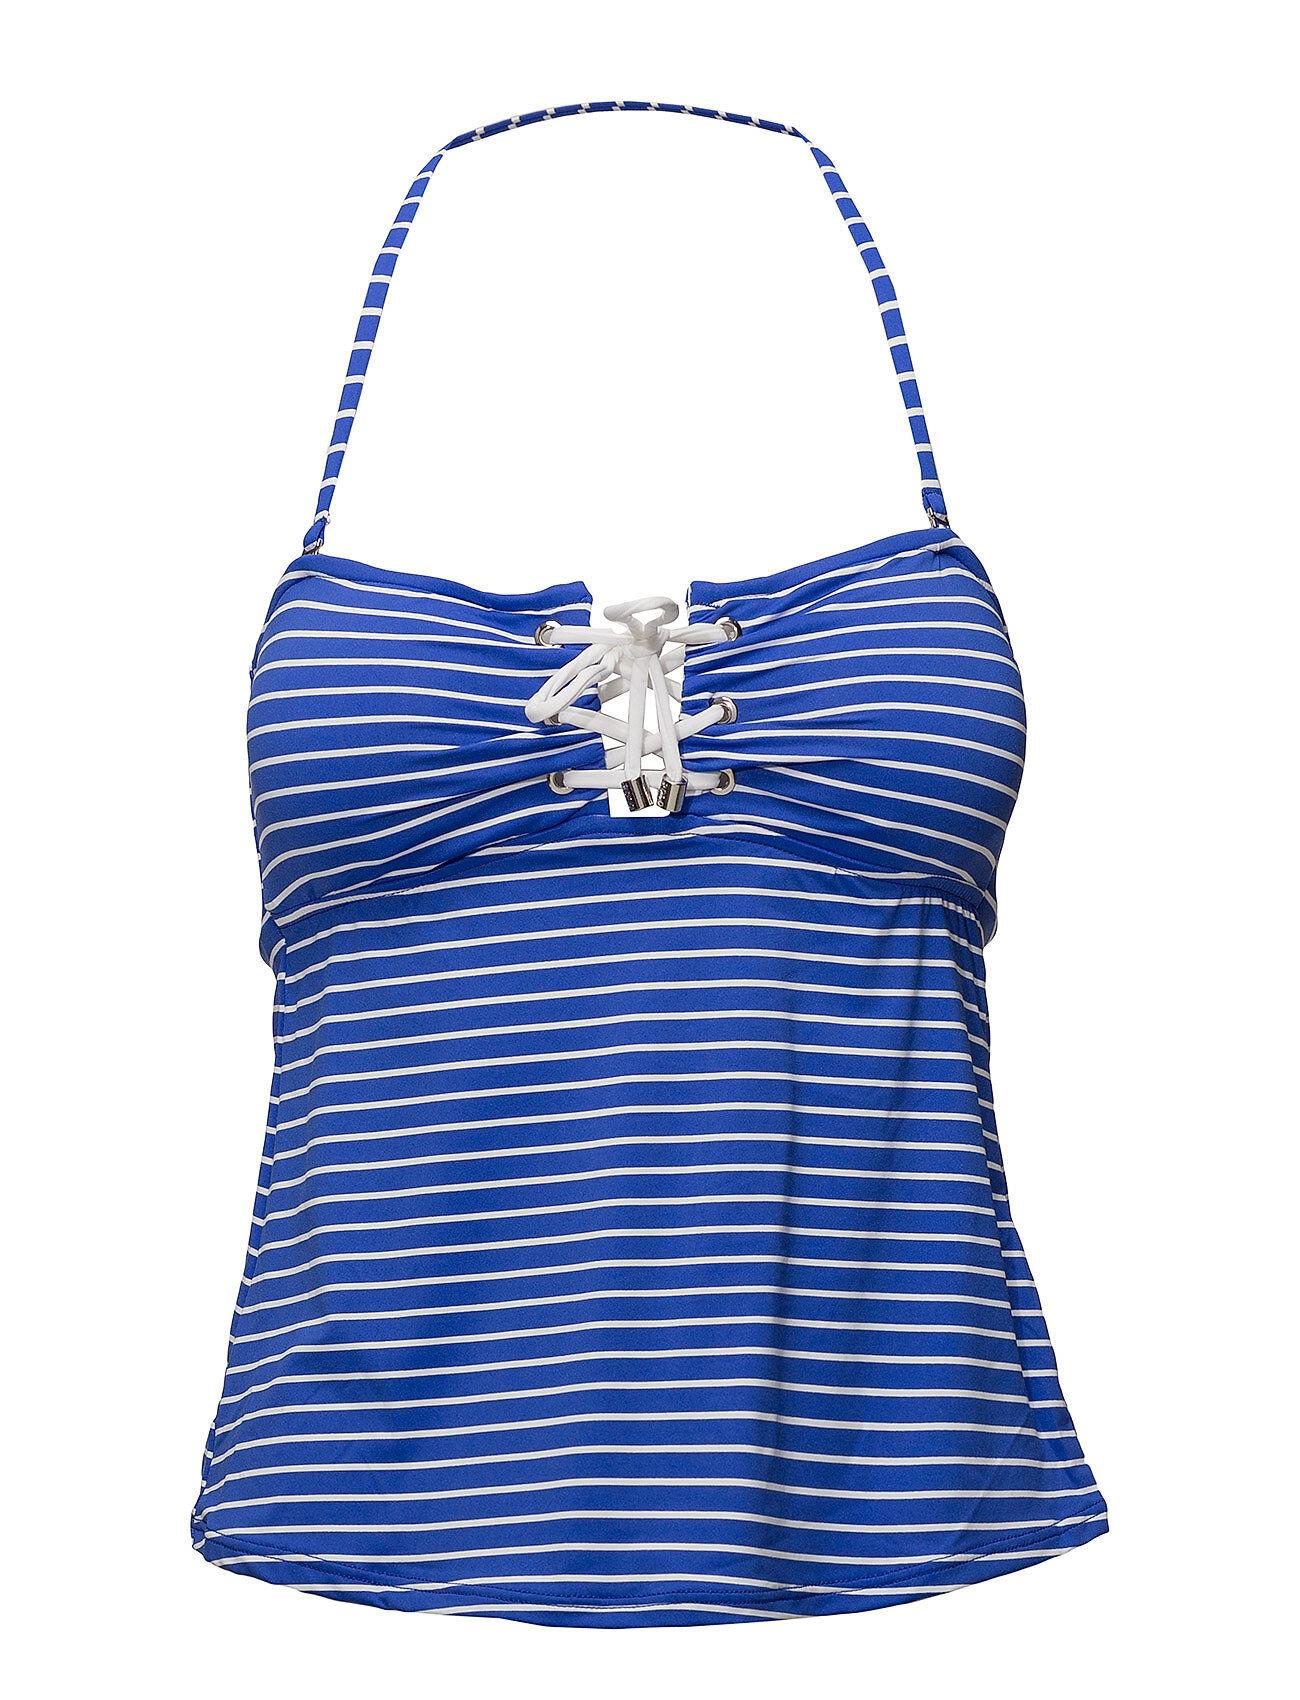 Polo Ralph Lauren Swimwear Resort Stripes Laced Tubini W Rem Cups